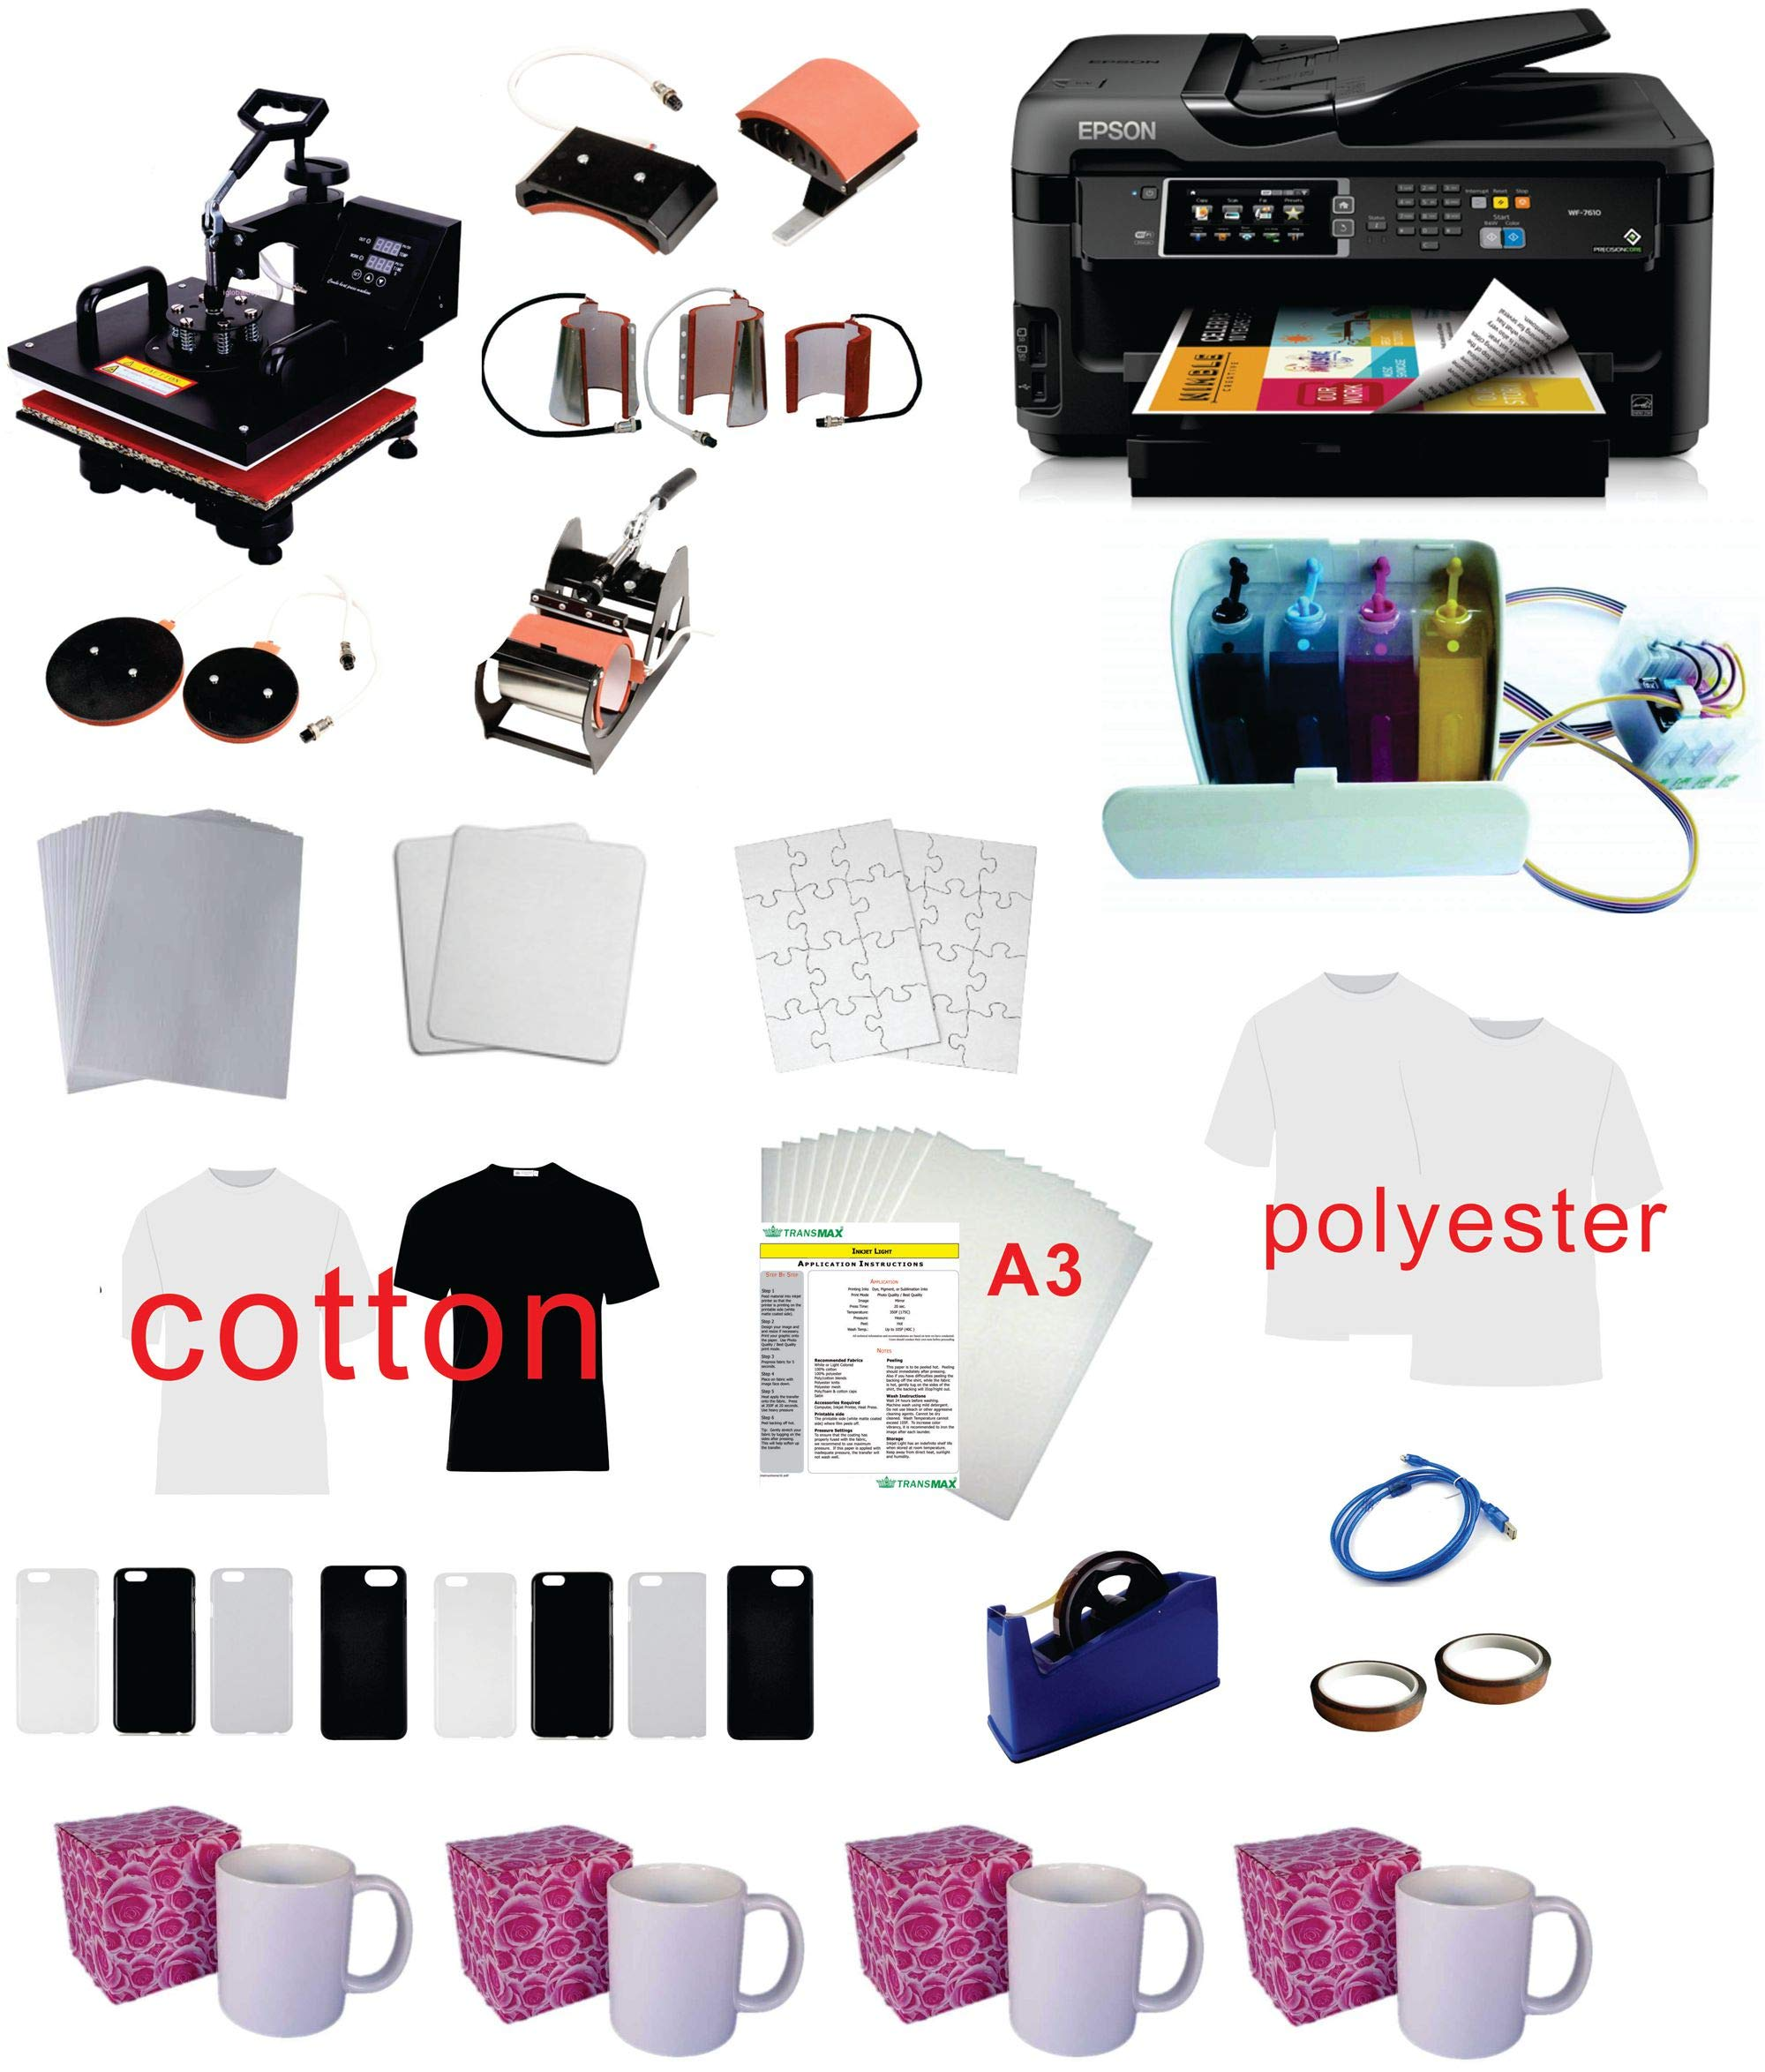 Pro Sublimation 15''x15'' 8in1 Heat Press WF-7710(11''x17'') Printer CISS kit